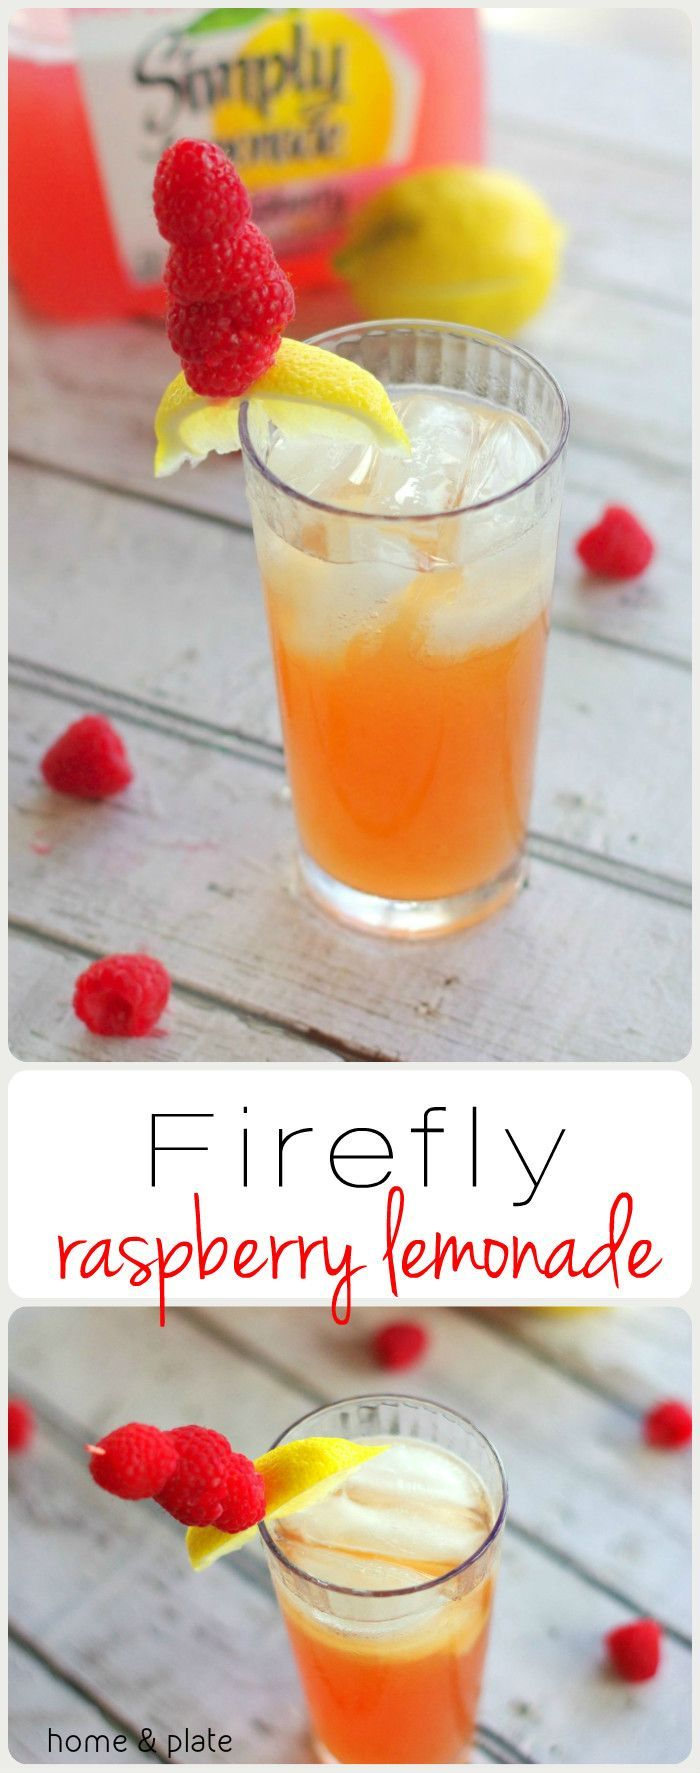 raspberry lemonade cocktail sweet tea vodka drinks spiked sweet ...